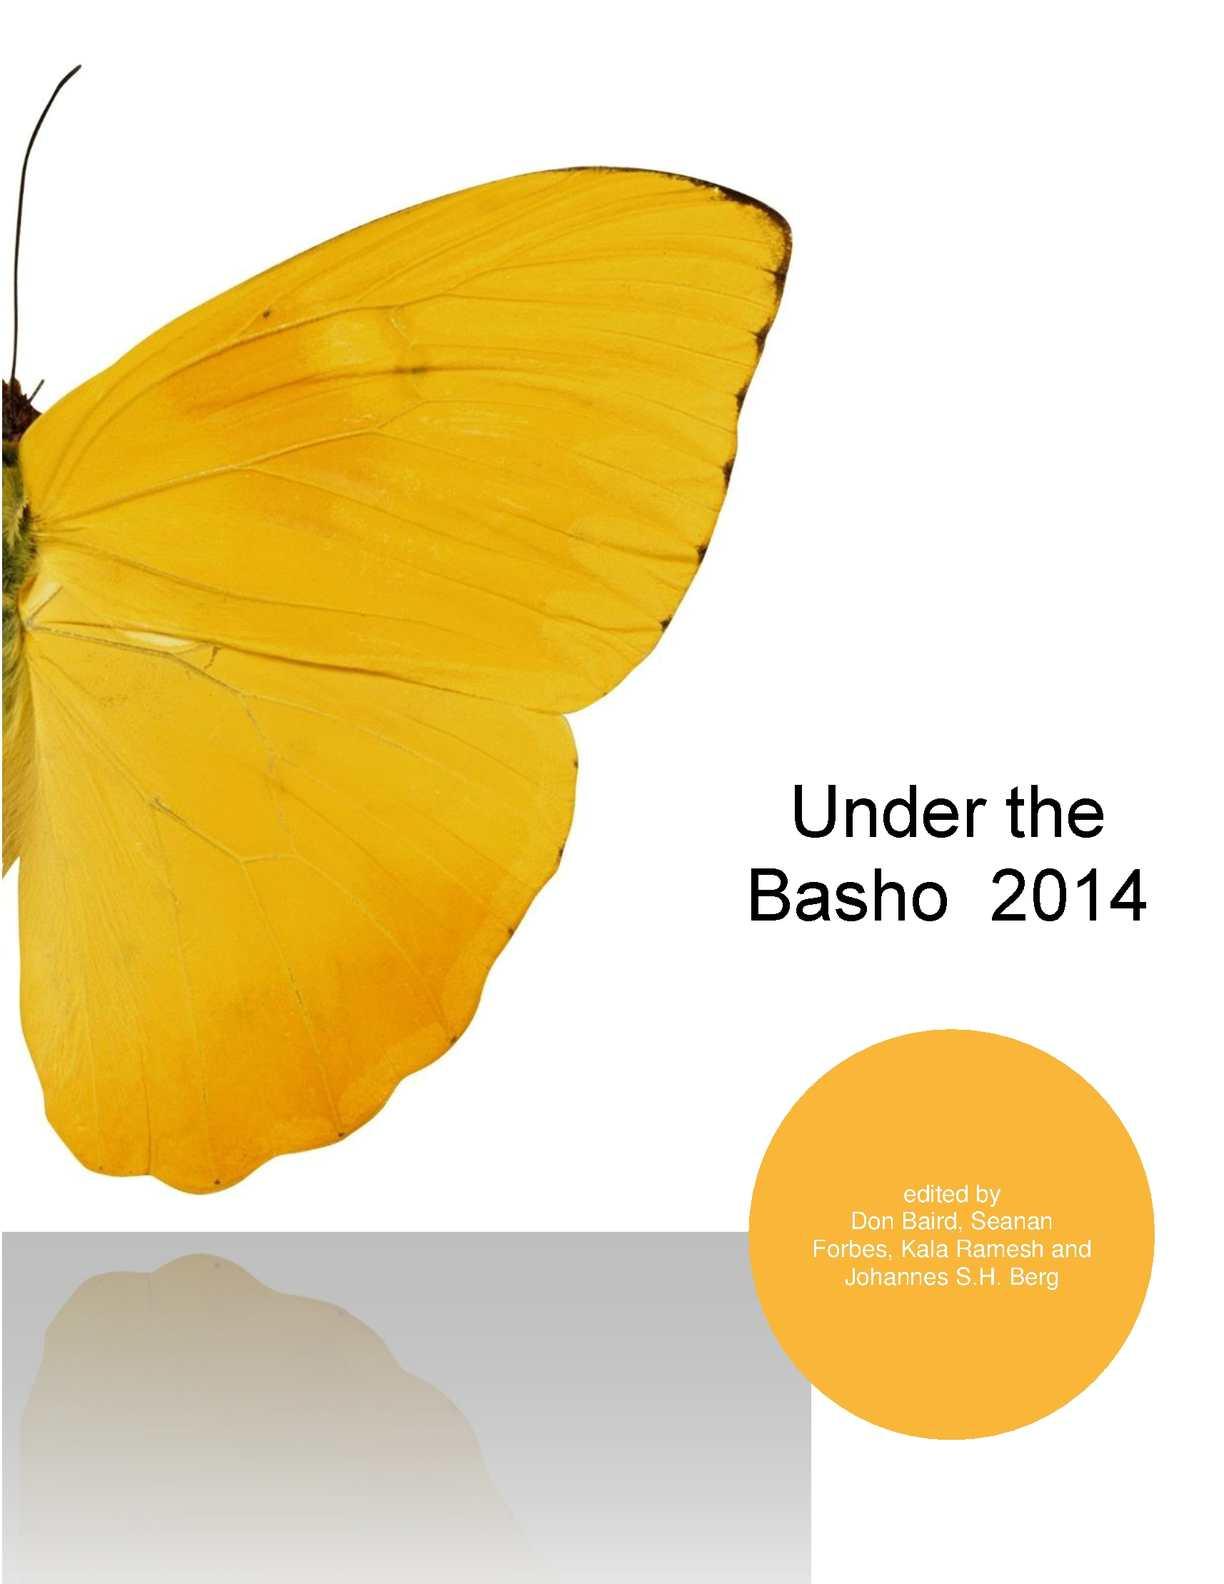 Calaméo - Under the Basho 2014